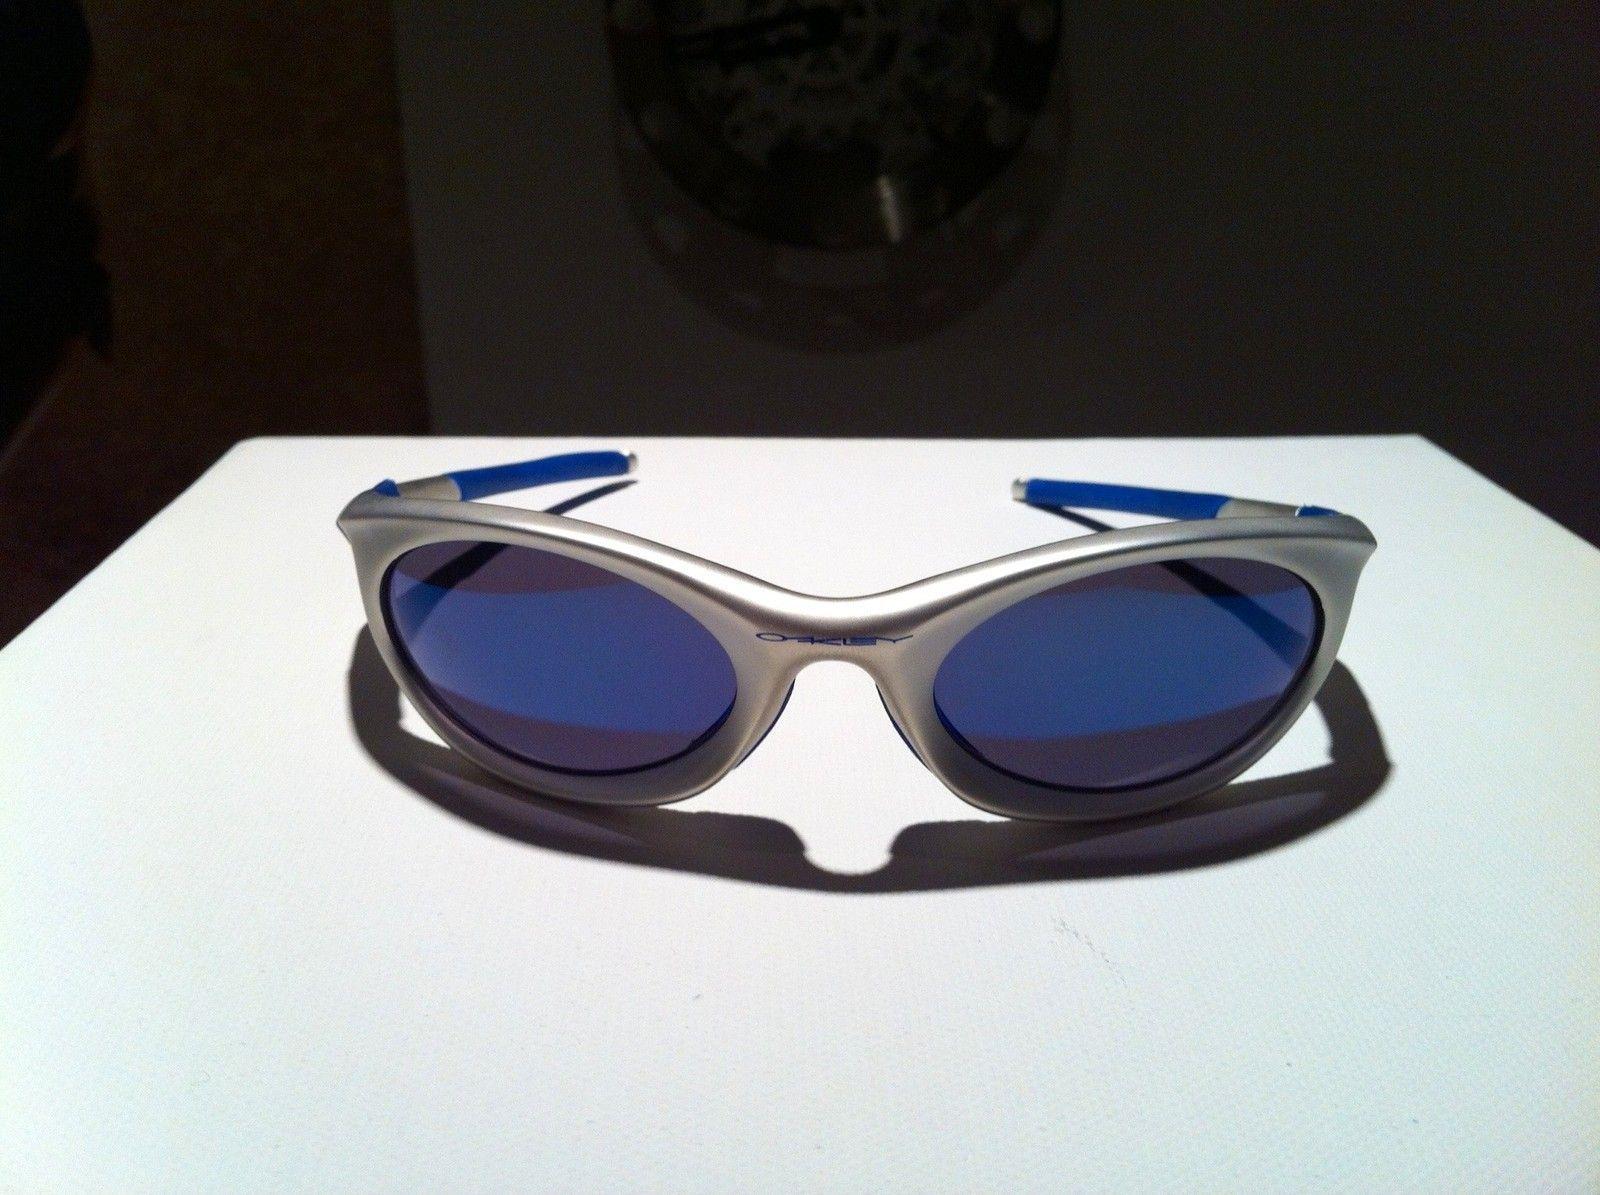 Eye Jacket 3.0 Fmj 5.56 W/ Ice Iridium - UthMi.jpg